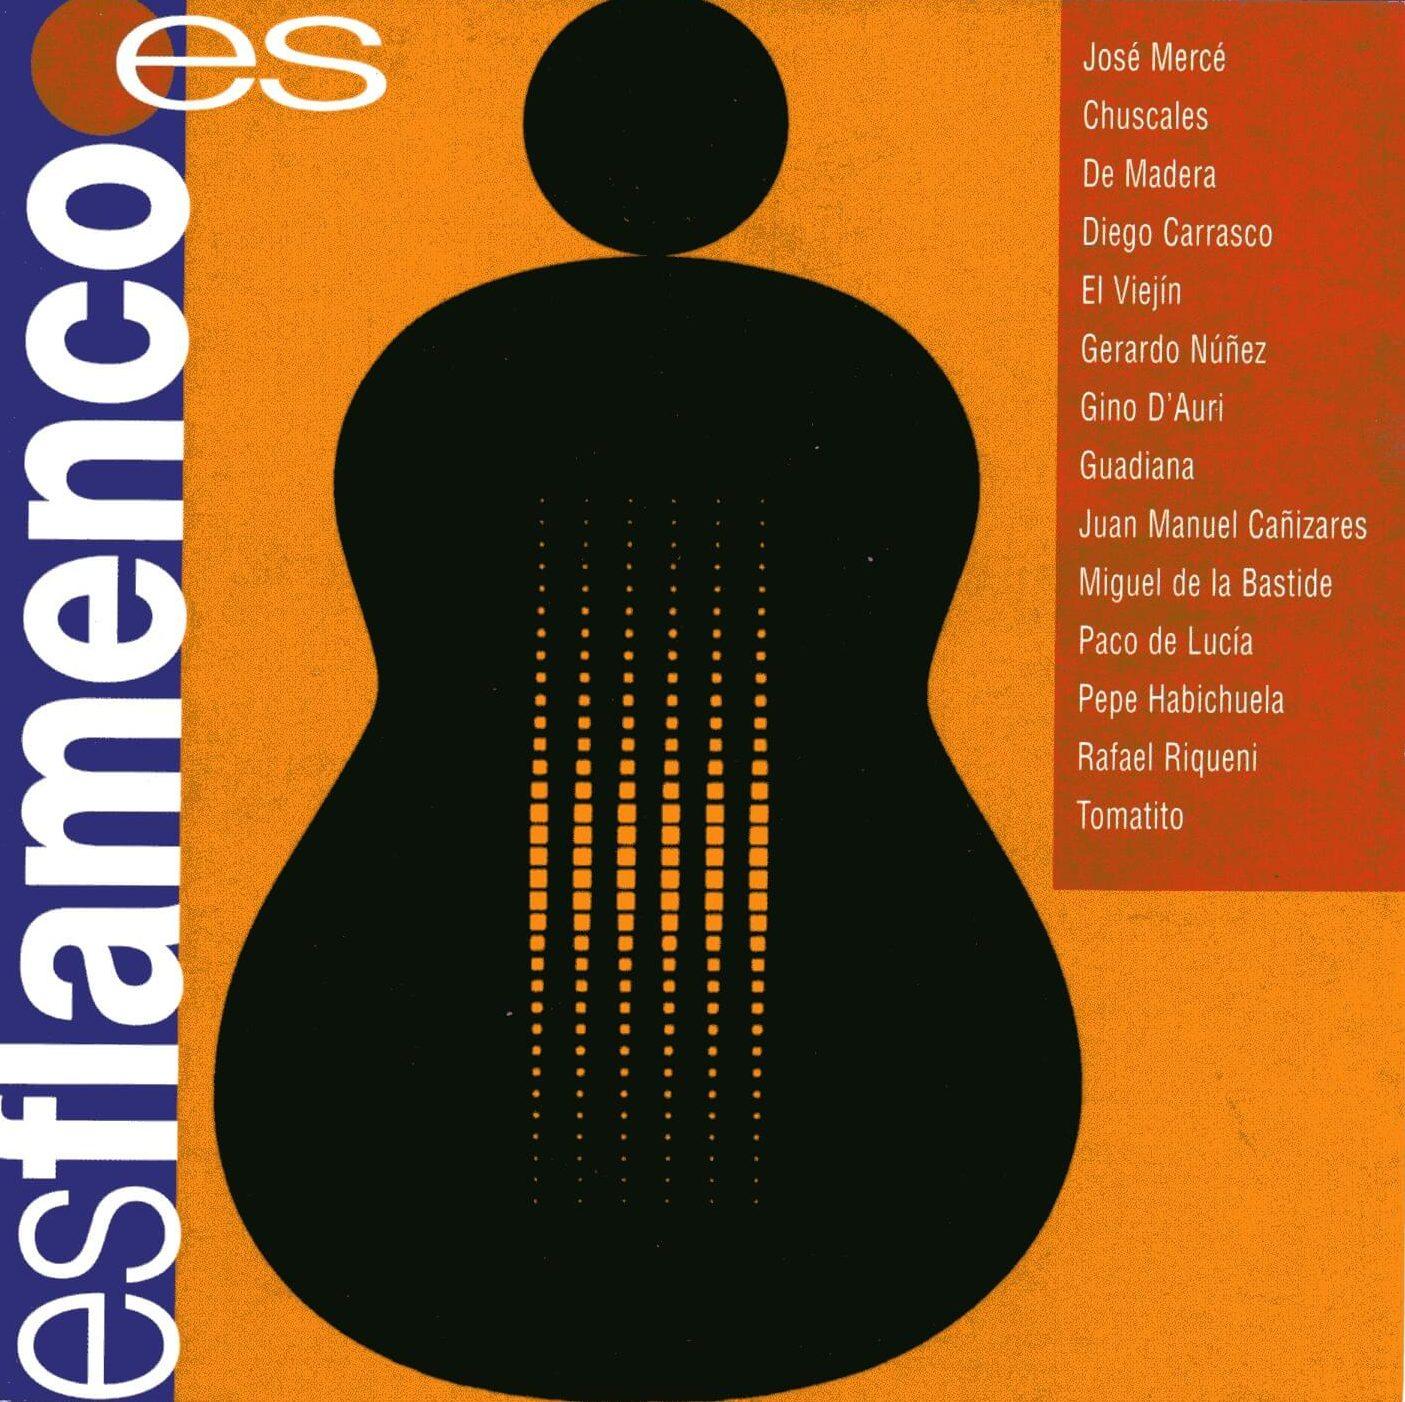 ES FLAMENCO | Recopilatorio temas flamenco